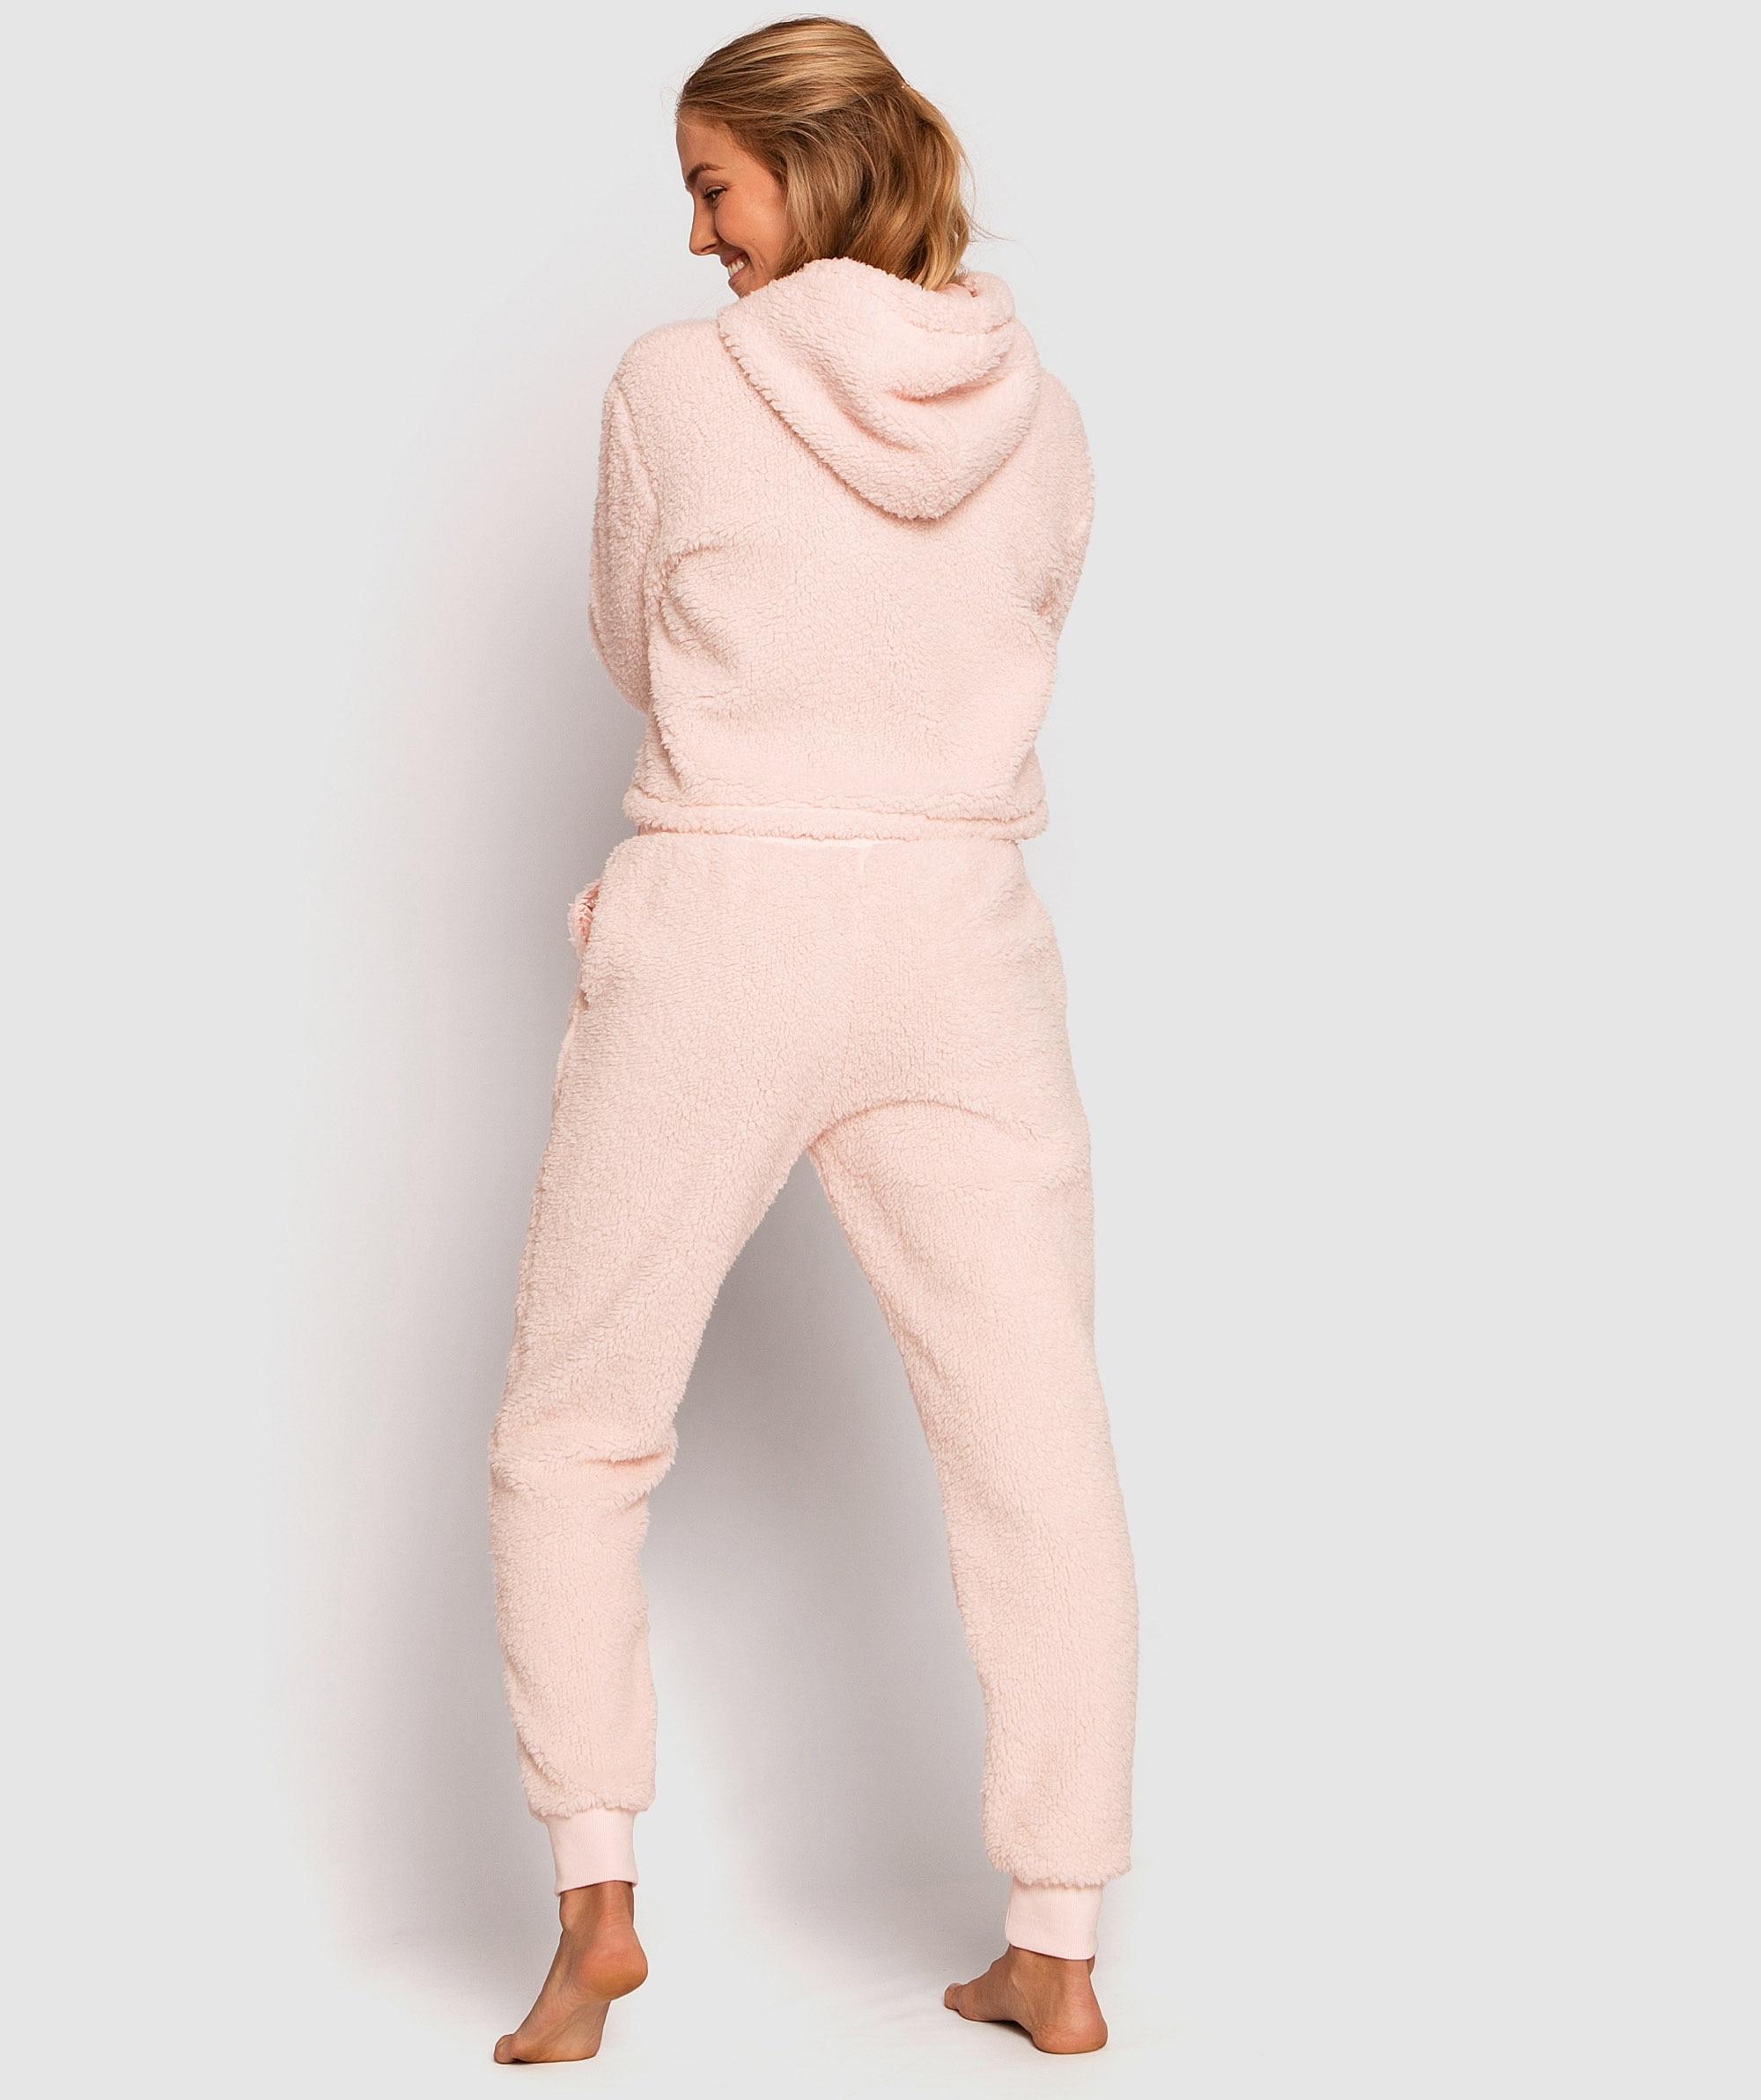 Teddy Long Pants - Pink